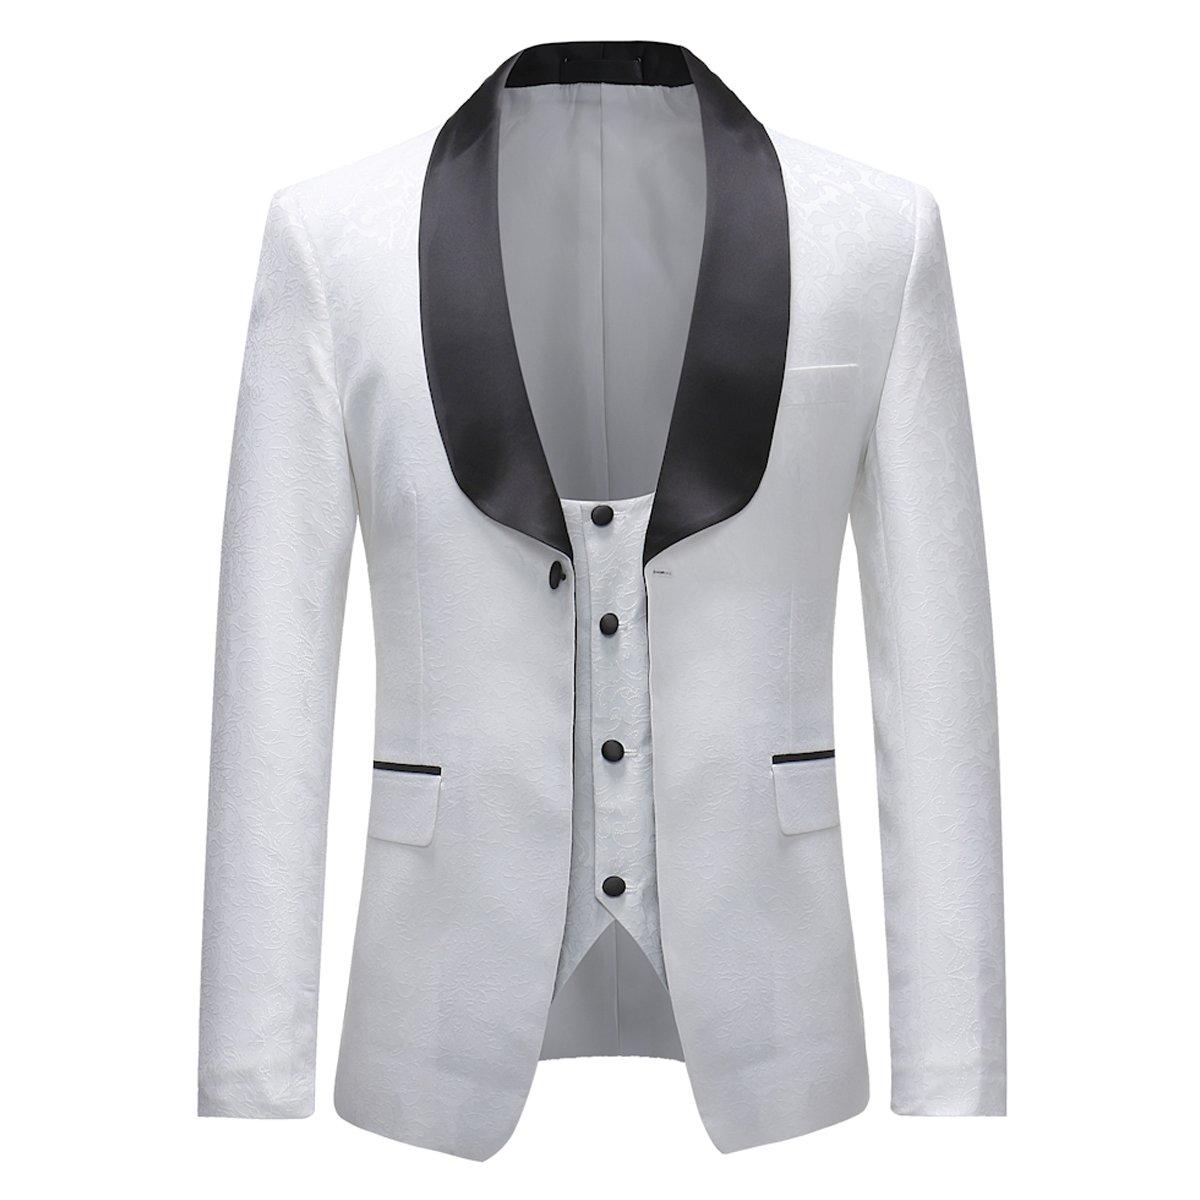 5e8598e7ebf6 Mens Suits 3 Pieces Slim Fit Wedding Dinner Tuxedo Jacket Single Breasted  One Button Suit Blazer Waistcoat Black Trousers: Amazon.co.uk: Clothing